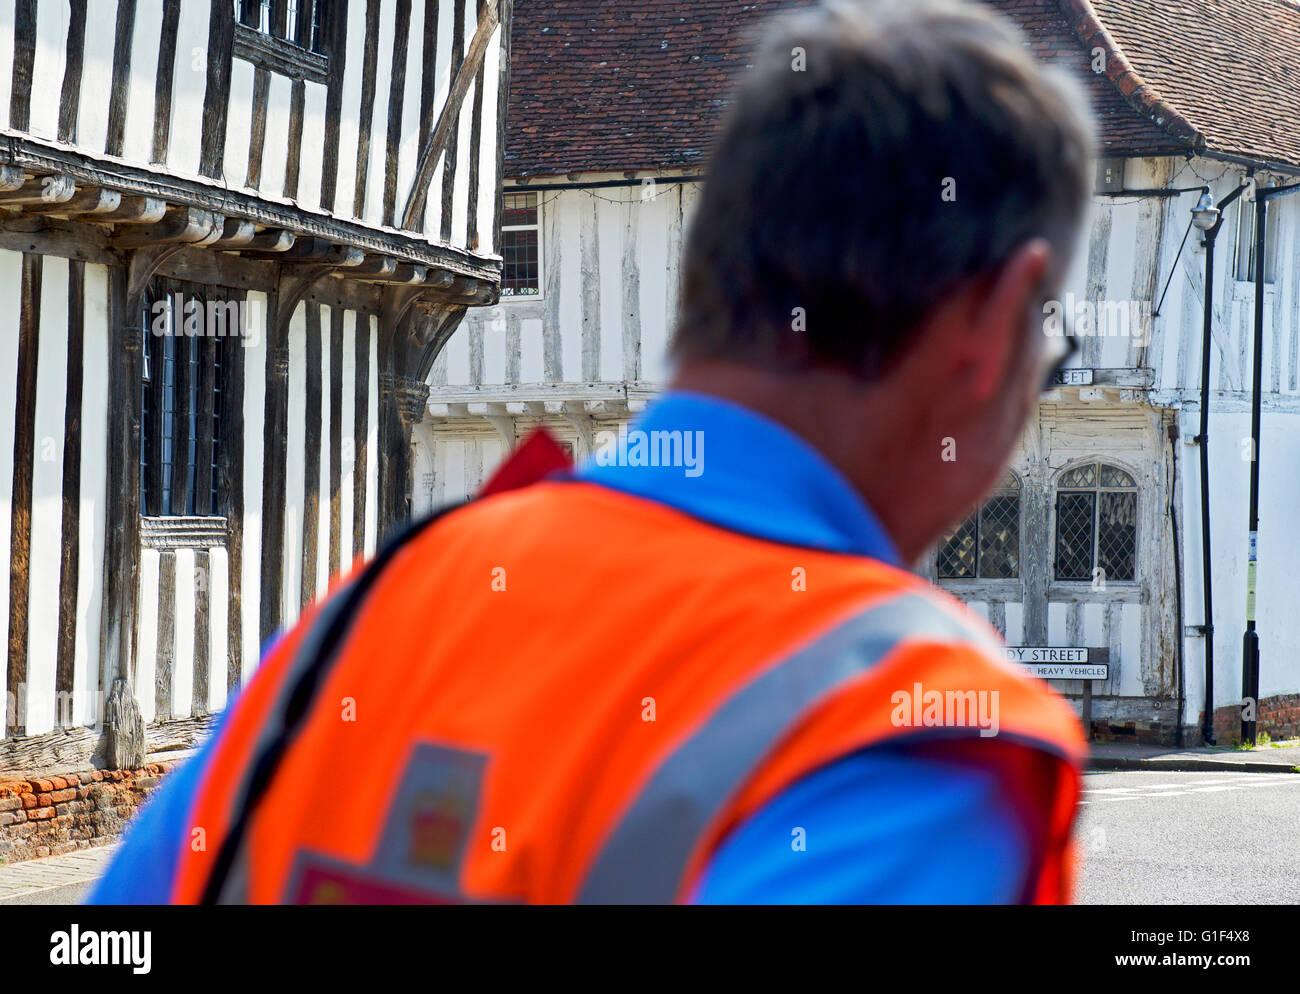 Postman in the medieval village of Lavenham, Suffolk, England UK - Stock Image